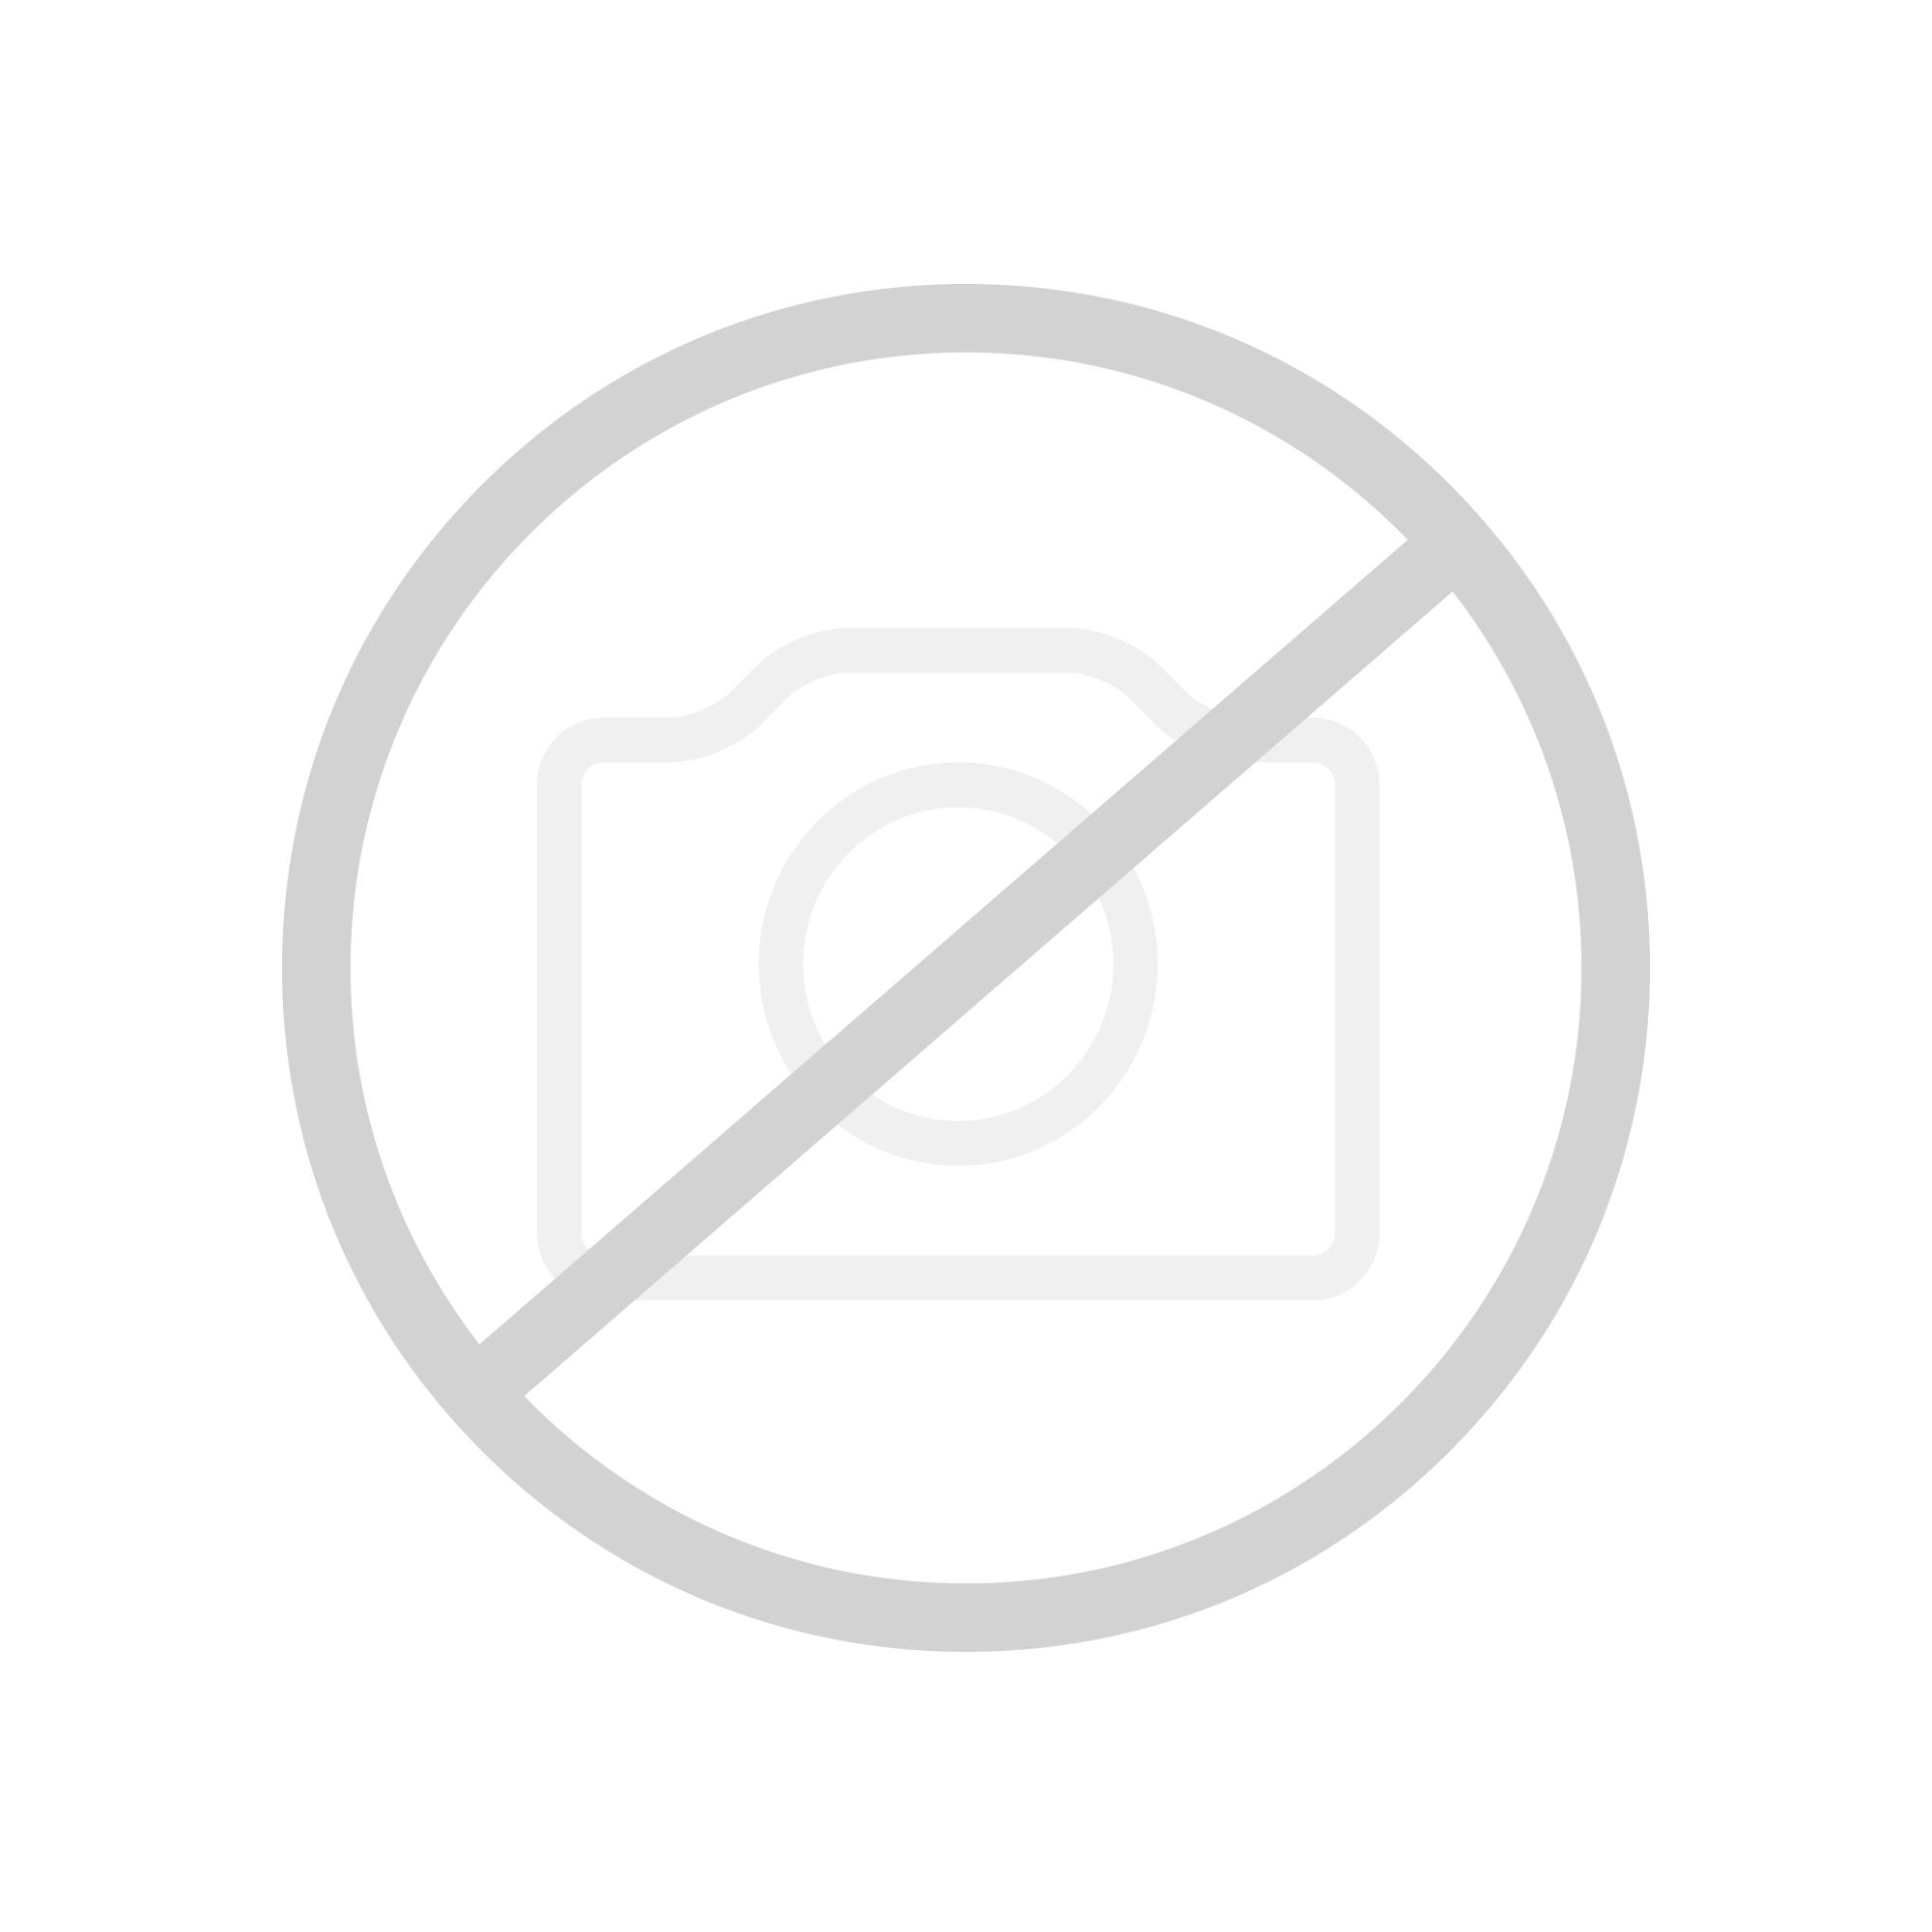 keuco moll eckduschkorb chrom wei 12757010000 reuter. Black Bedroom Furniture Sets. Home Design Ideas